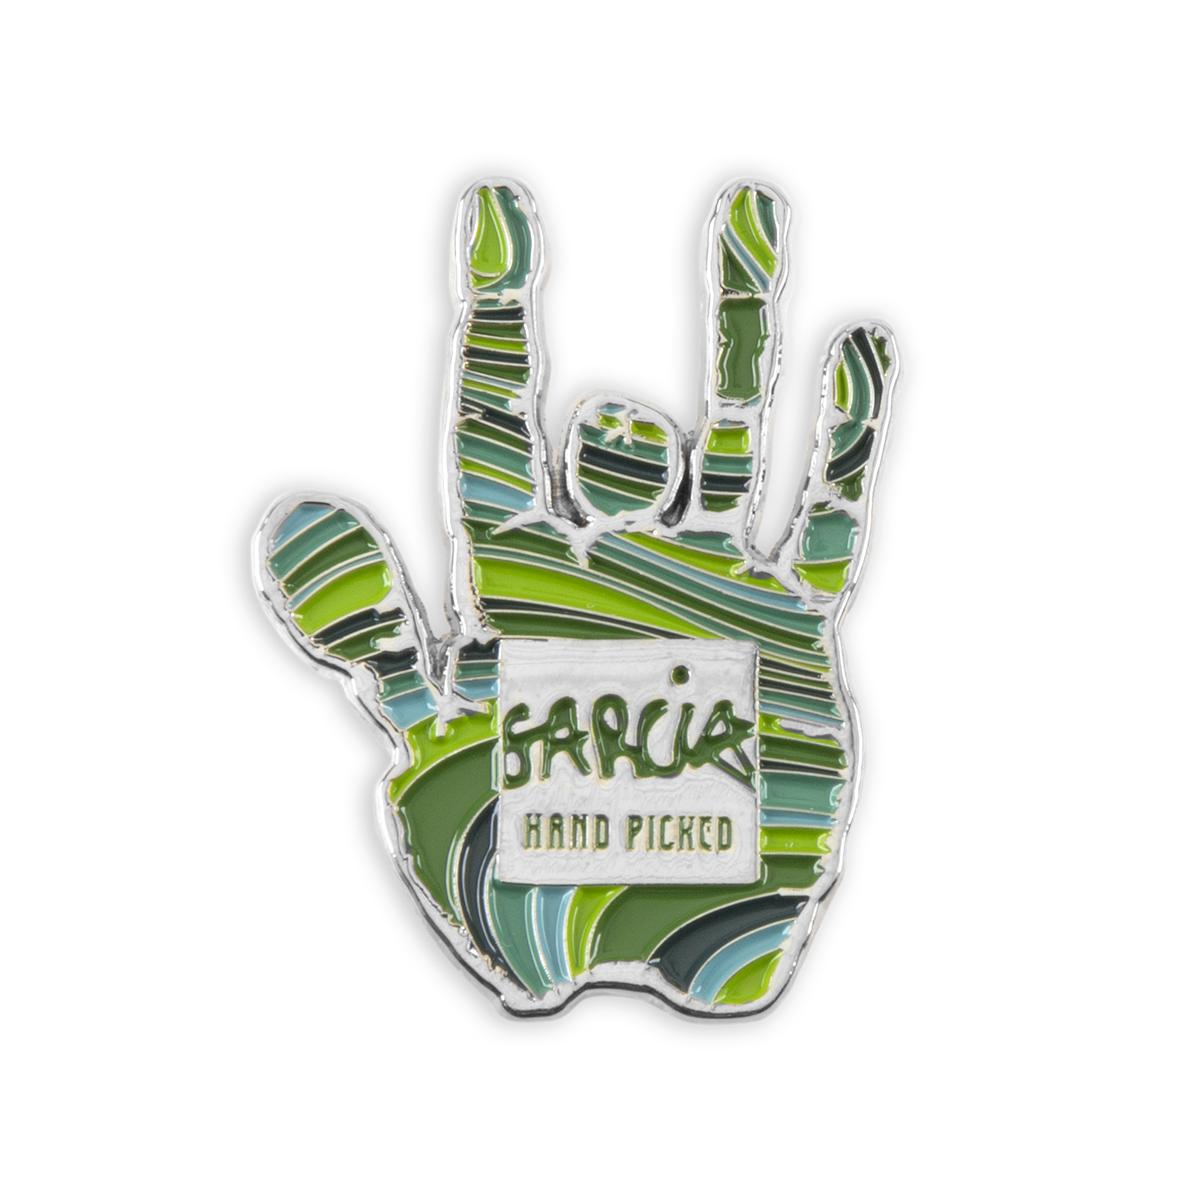 Garcia Hand Picked Handprint Pin